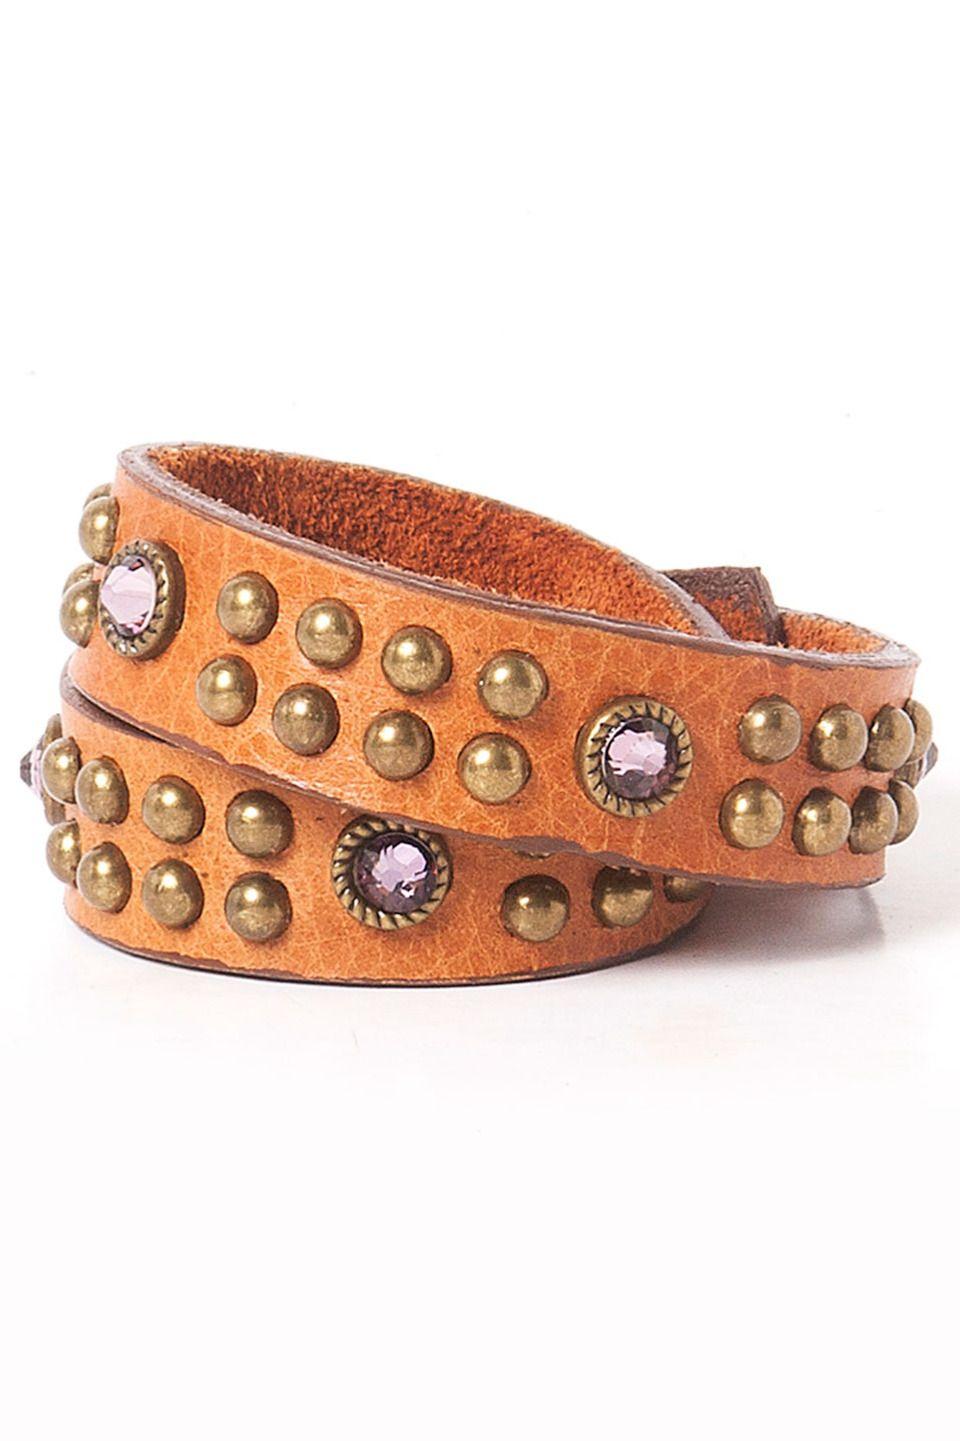 Leatherock Cassie Double Wrap Bracelet in Olden Tan - Beyond the Rack